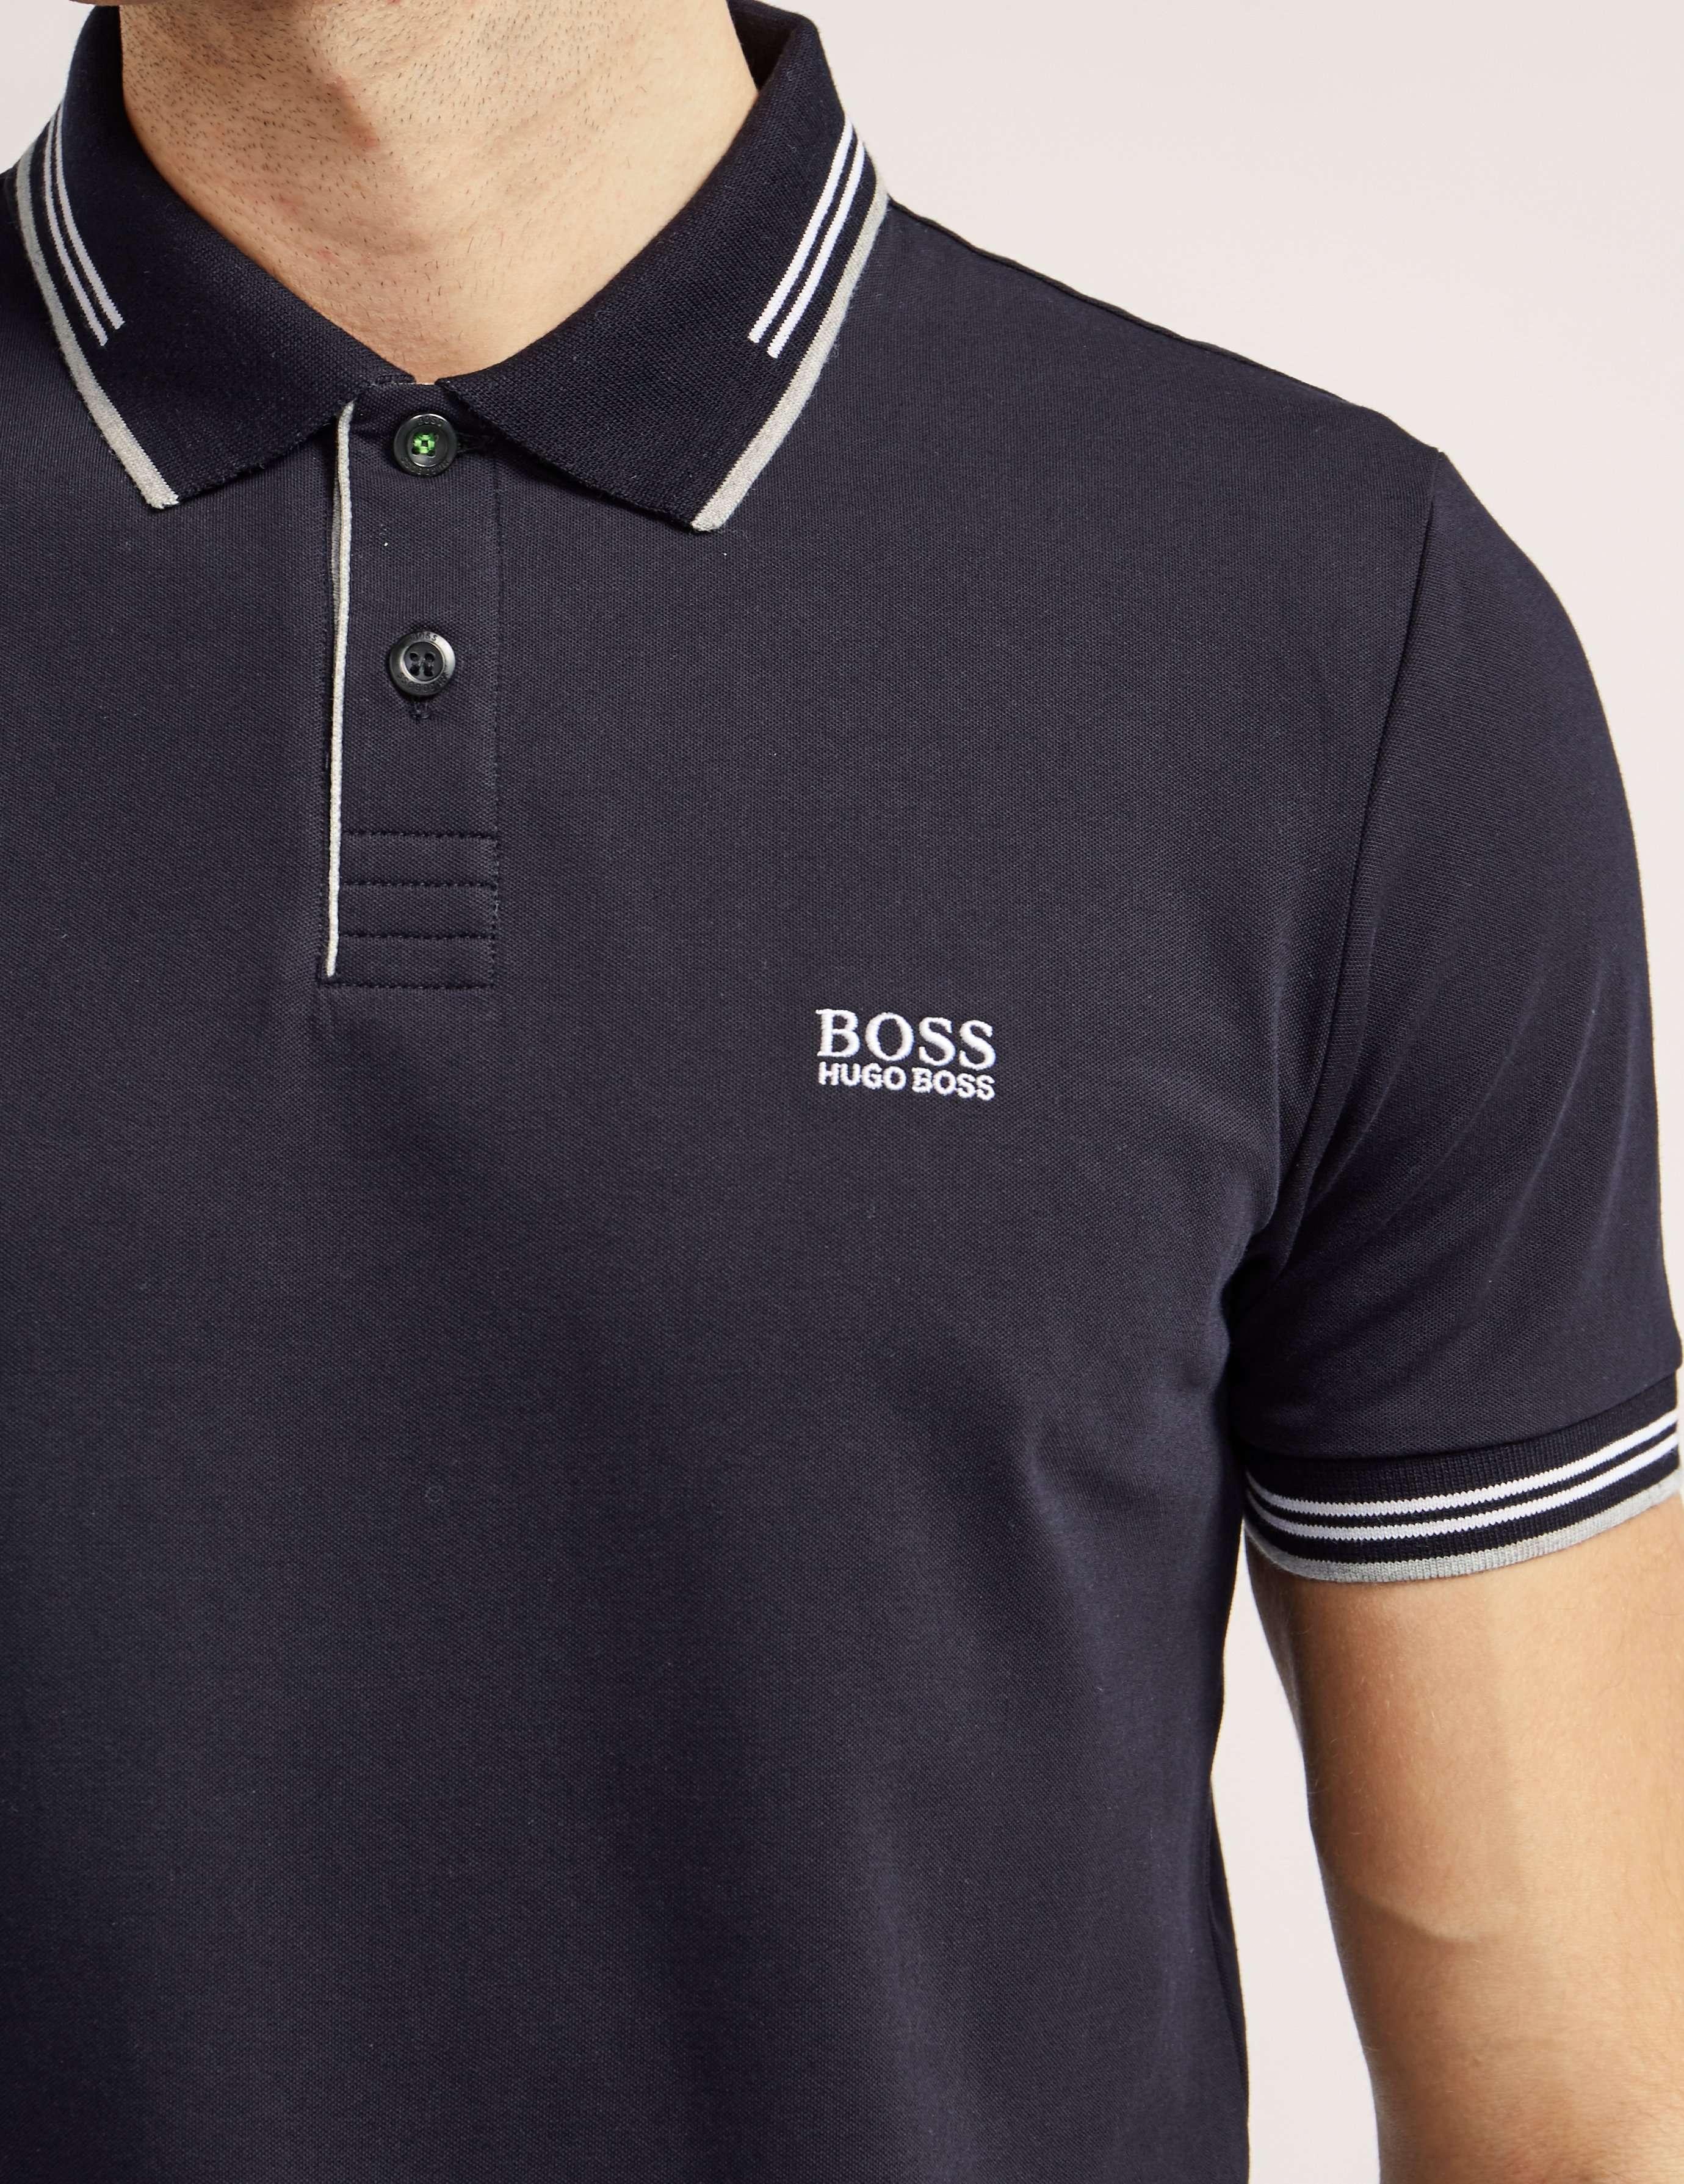 BOSS Green Tipped Polo Shirt